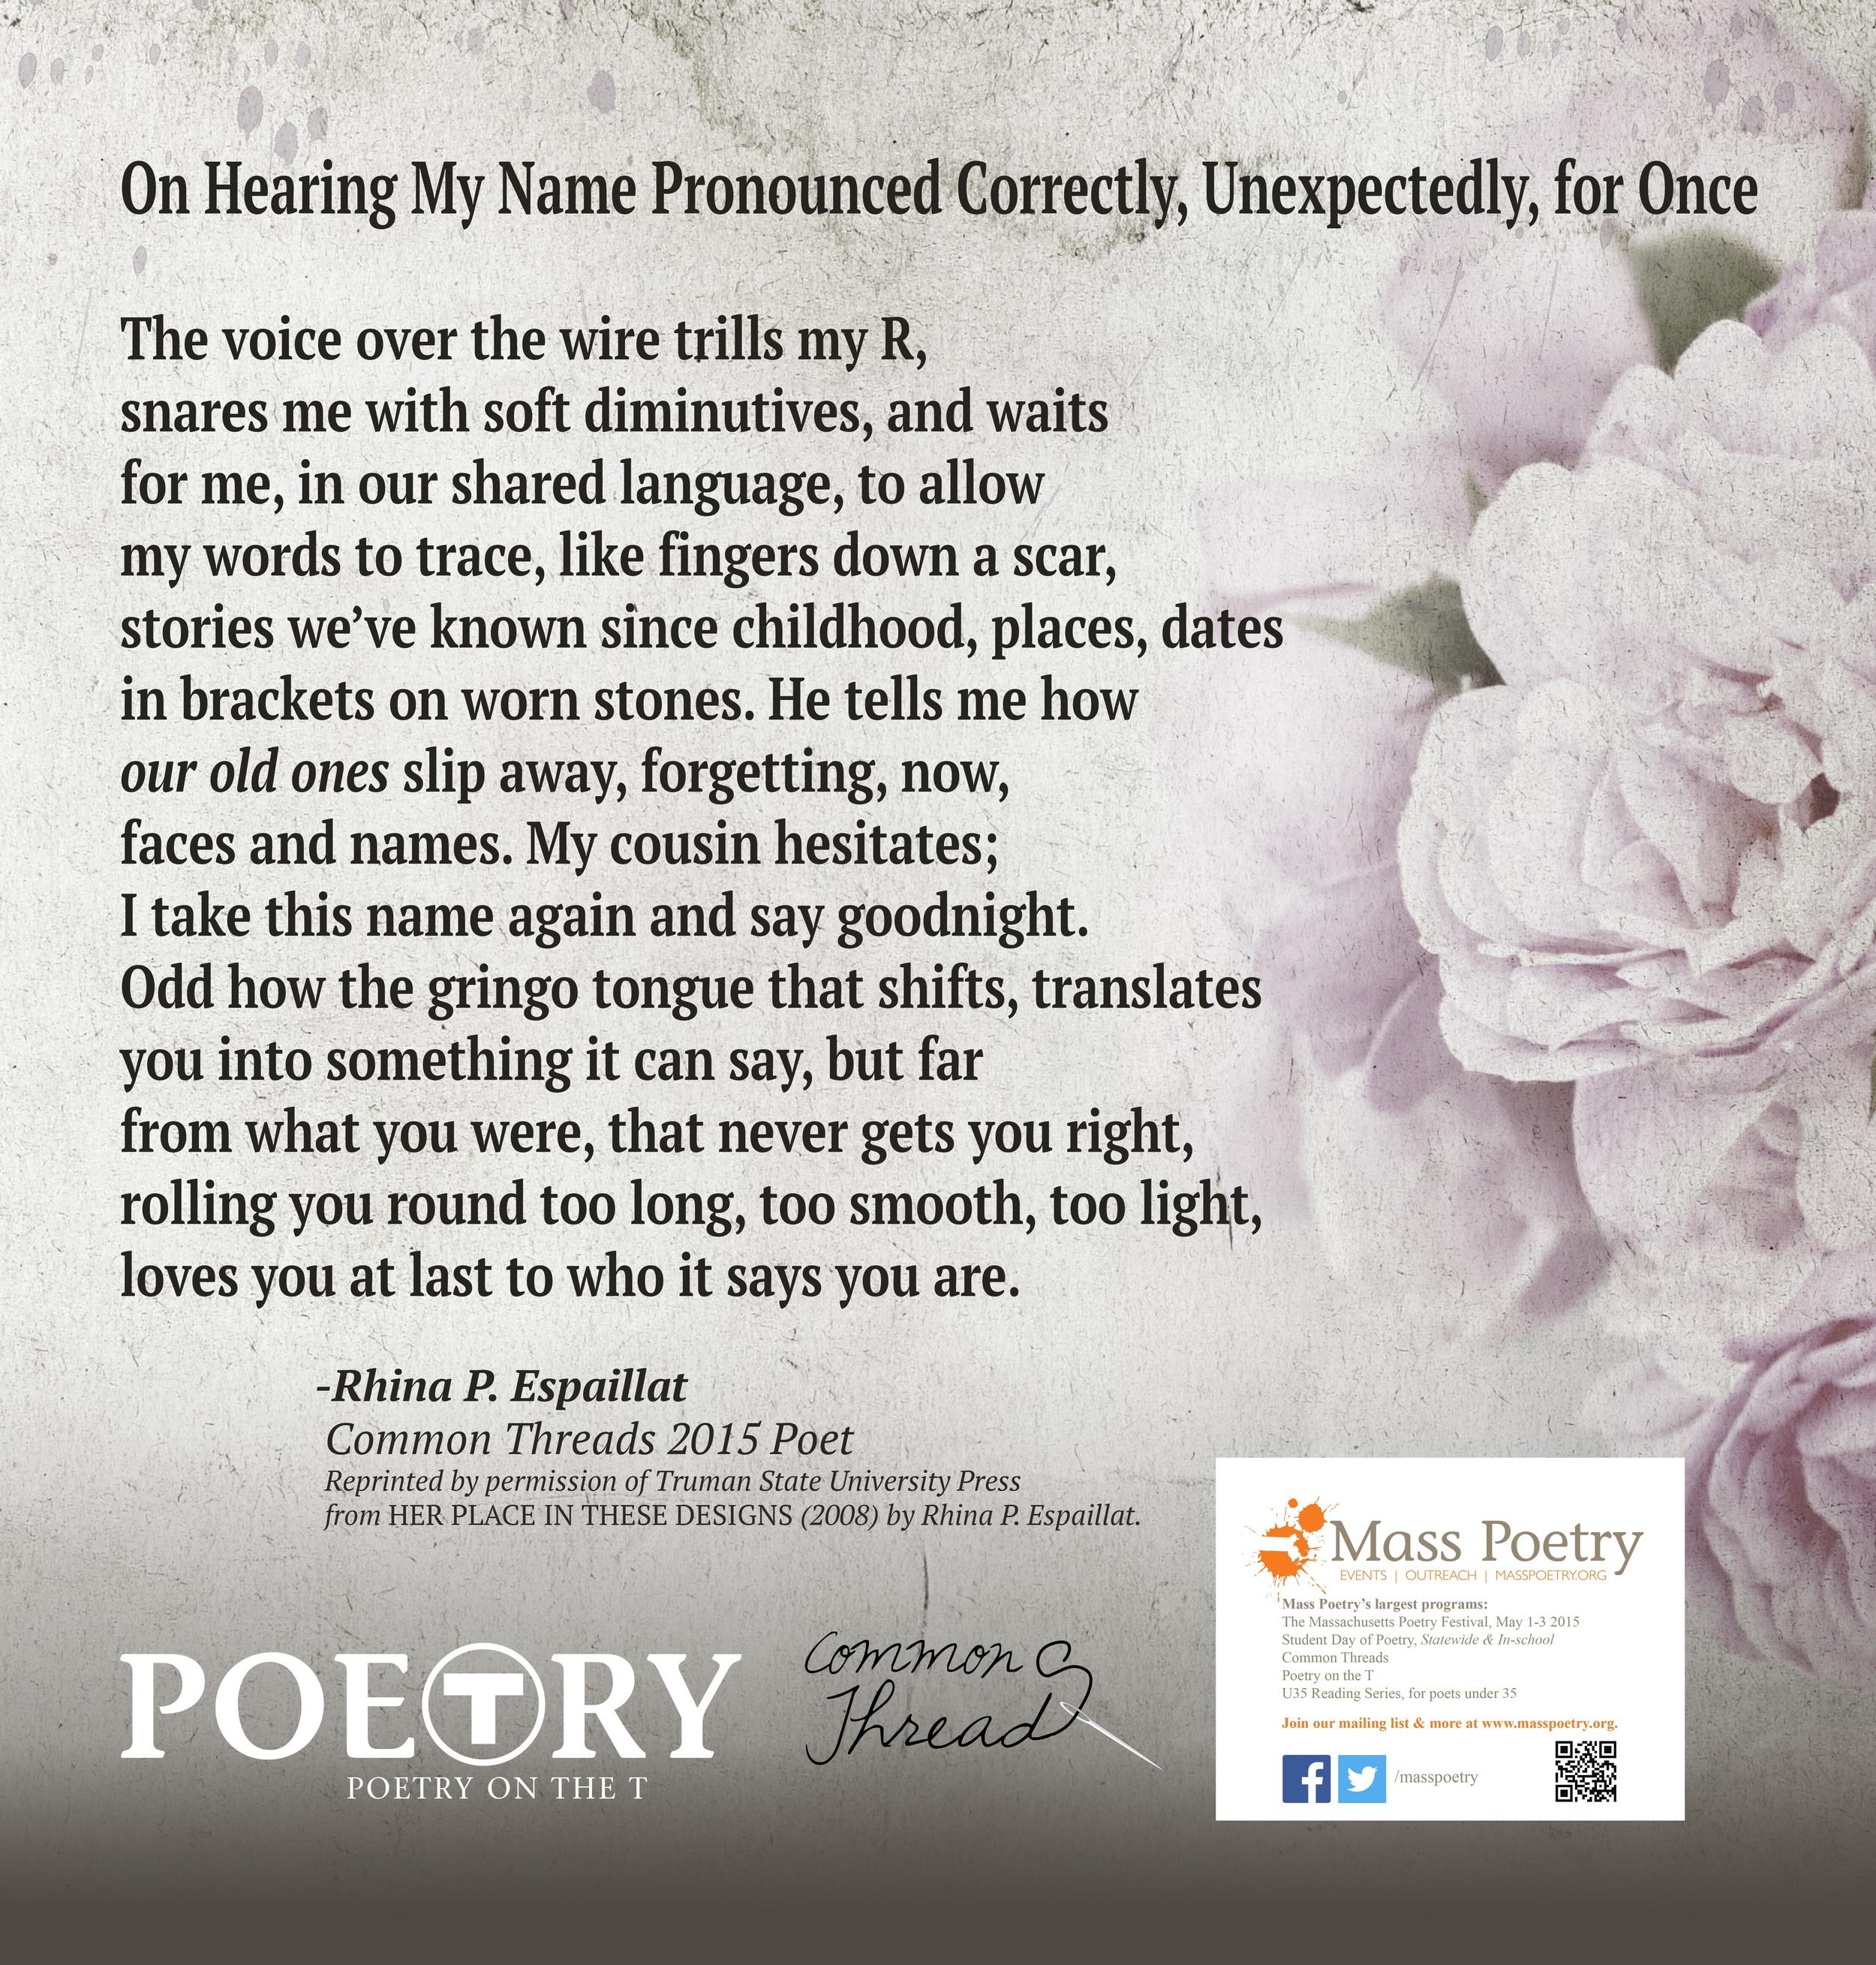 Rhina P. Espaillat Poetry on the T.jpg